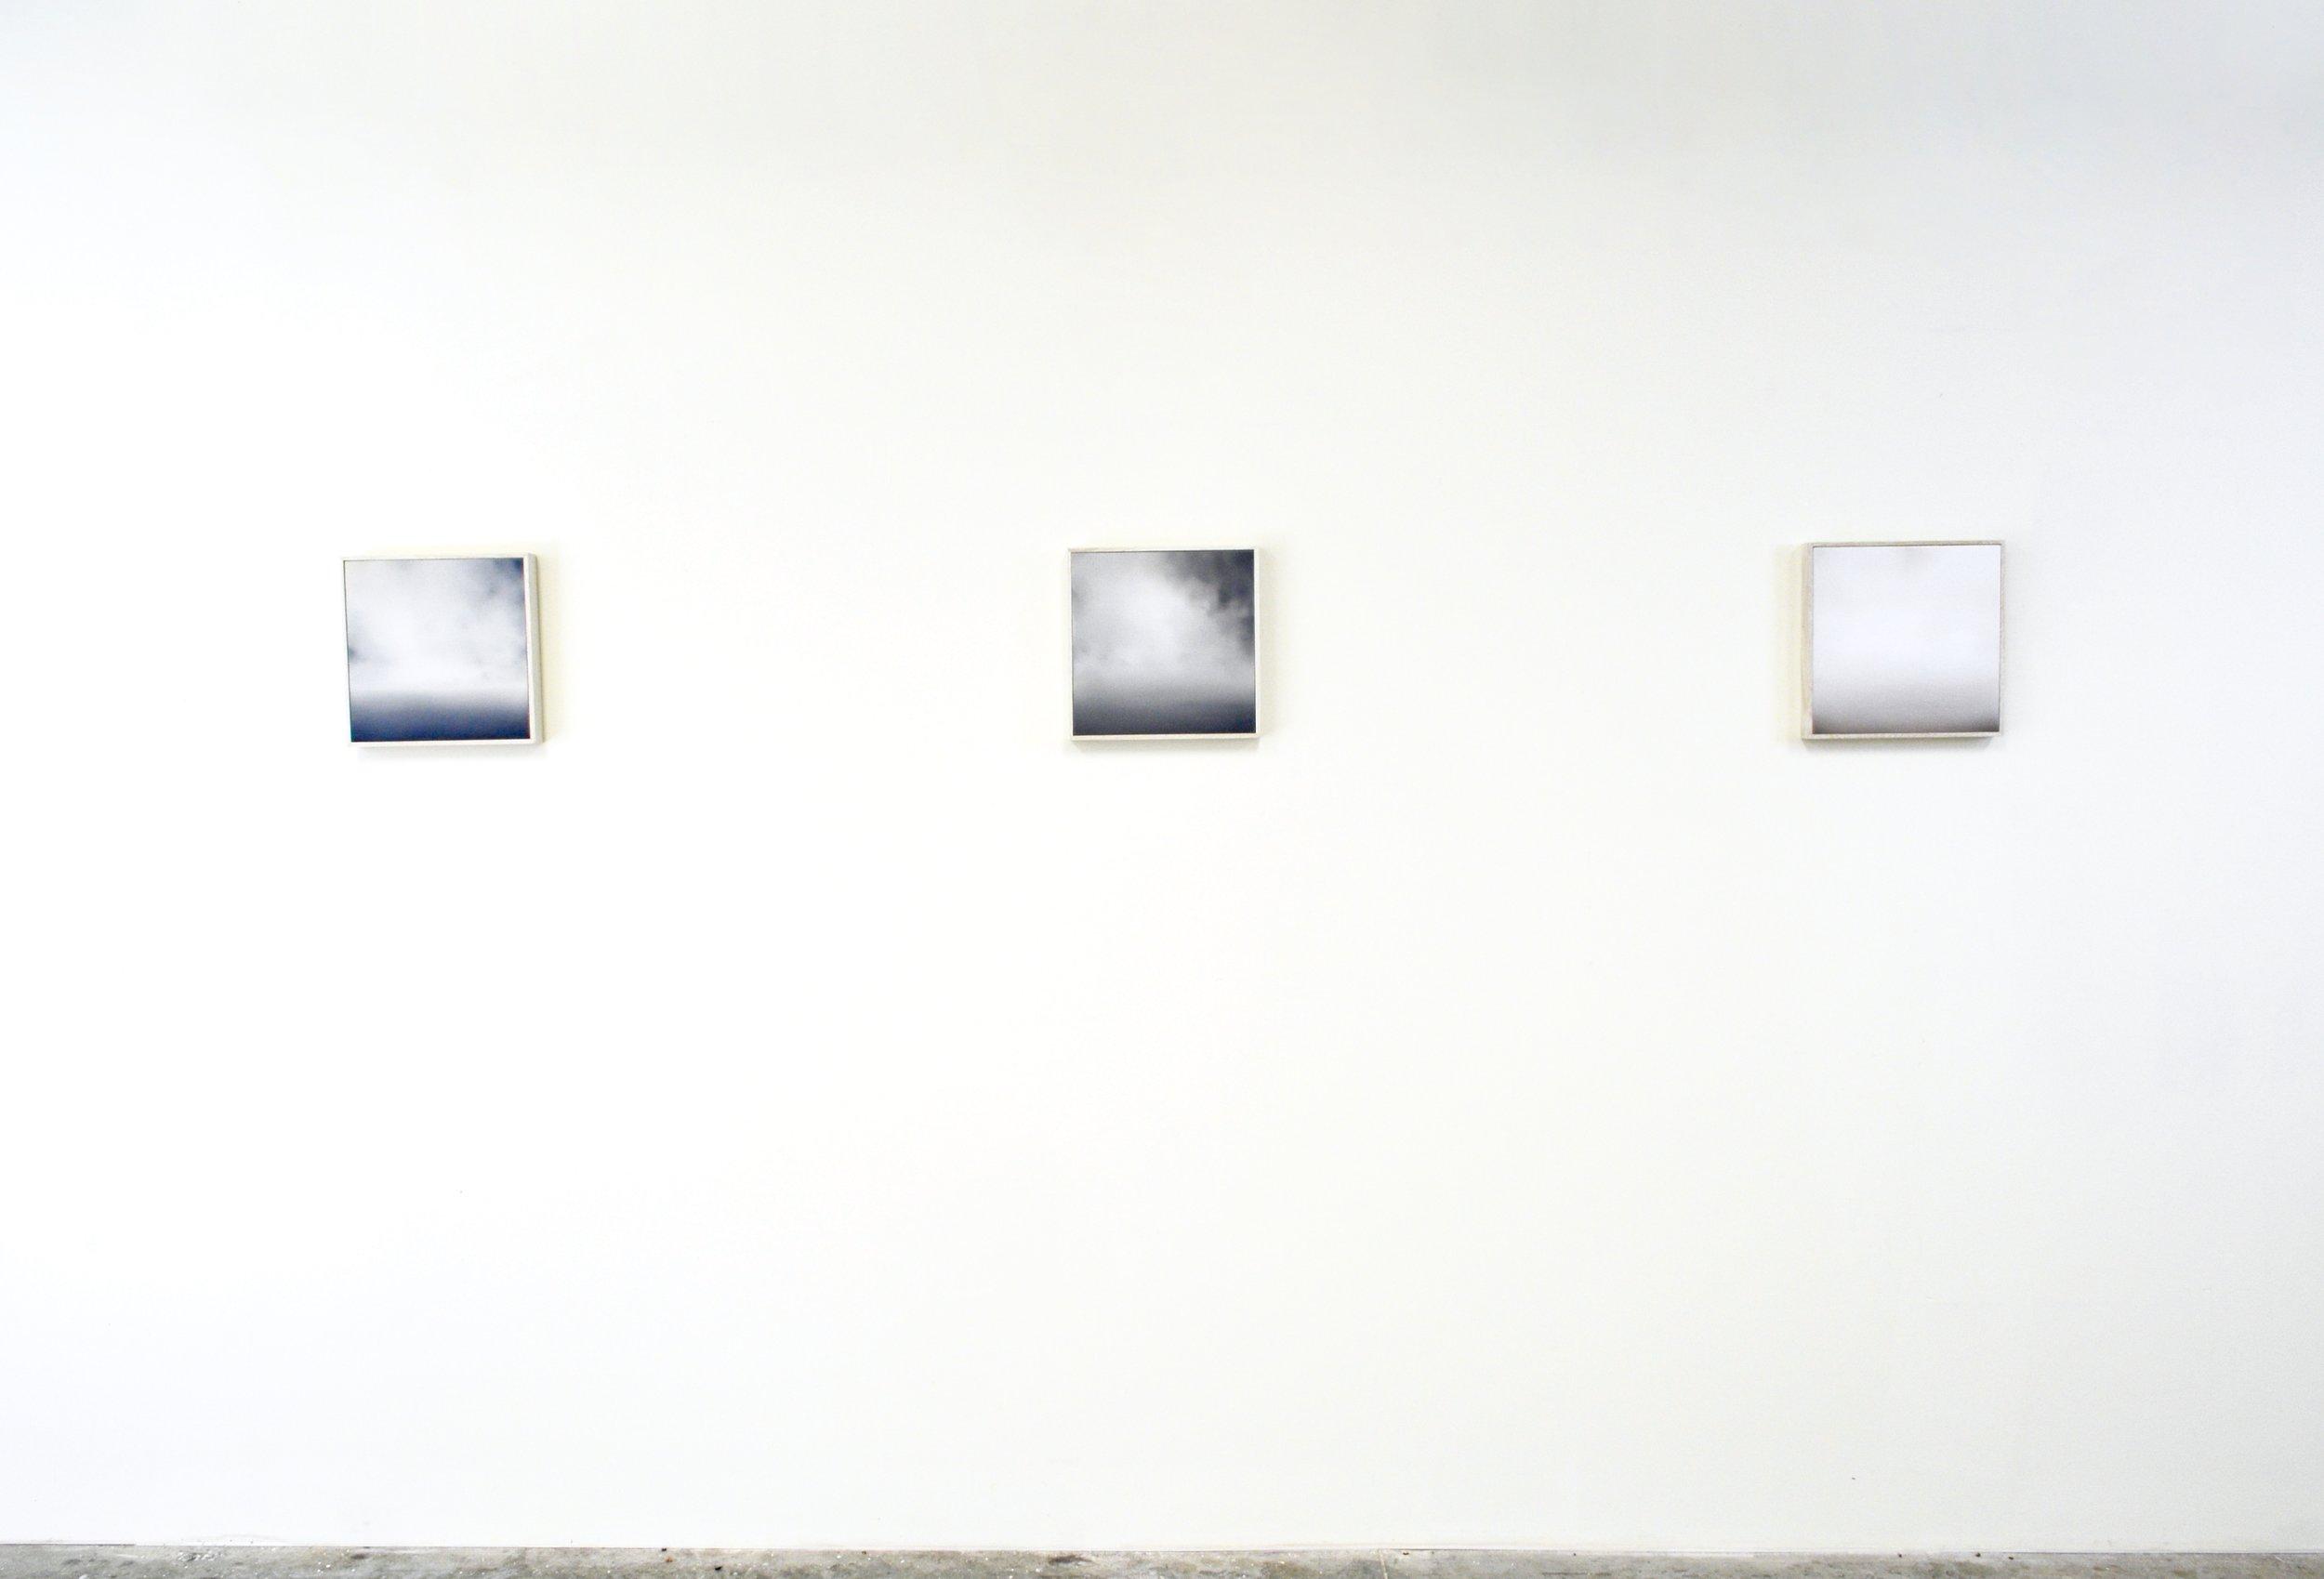 Installation View, The Sea XXVIII-XXX